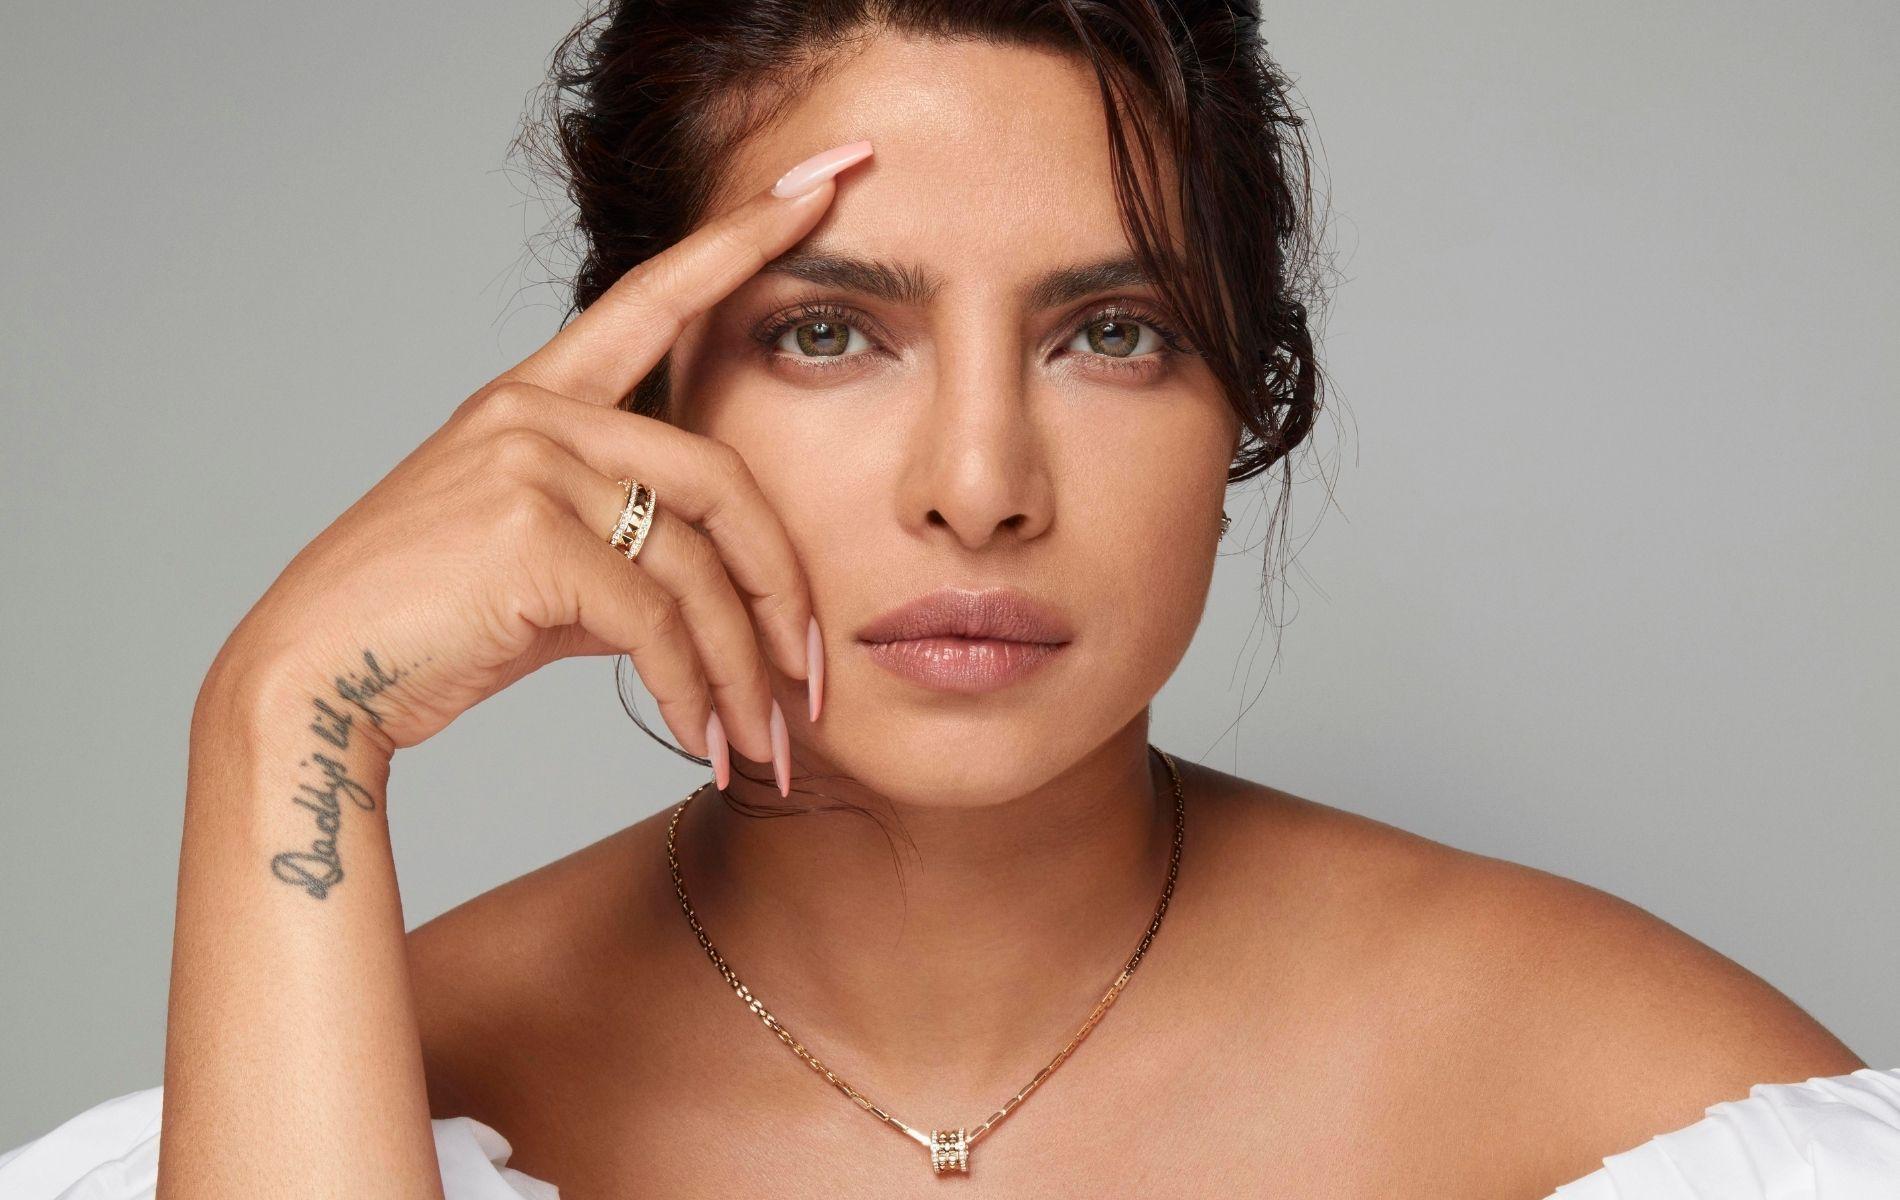 Bvlgari appoints Priyanka Chopra as its global brand ambassador | Bvlgari பிரியங்கா சோப்ராவை அதன் உலகளாவிய விளம்பர தூதராக நியமித்தது |_40.1